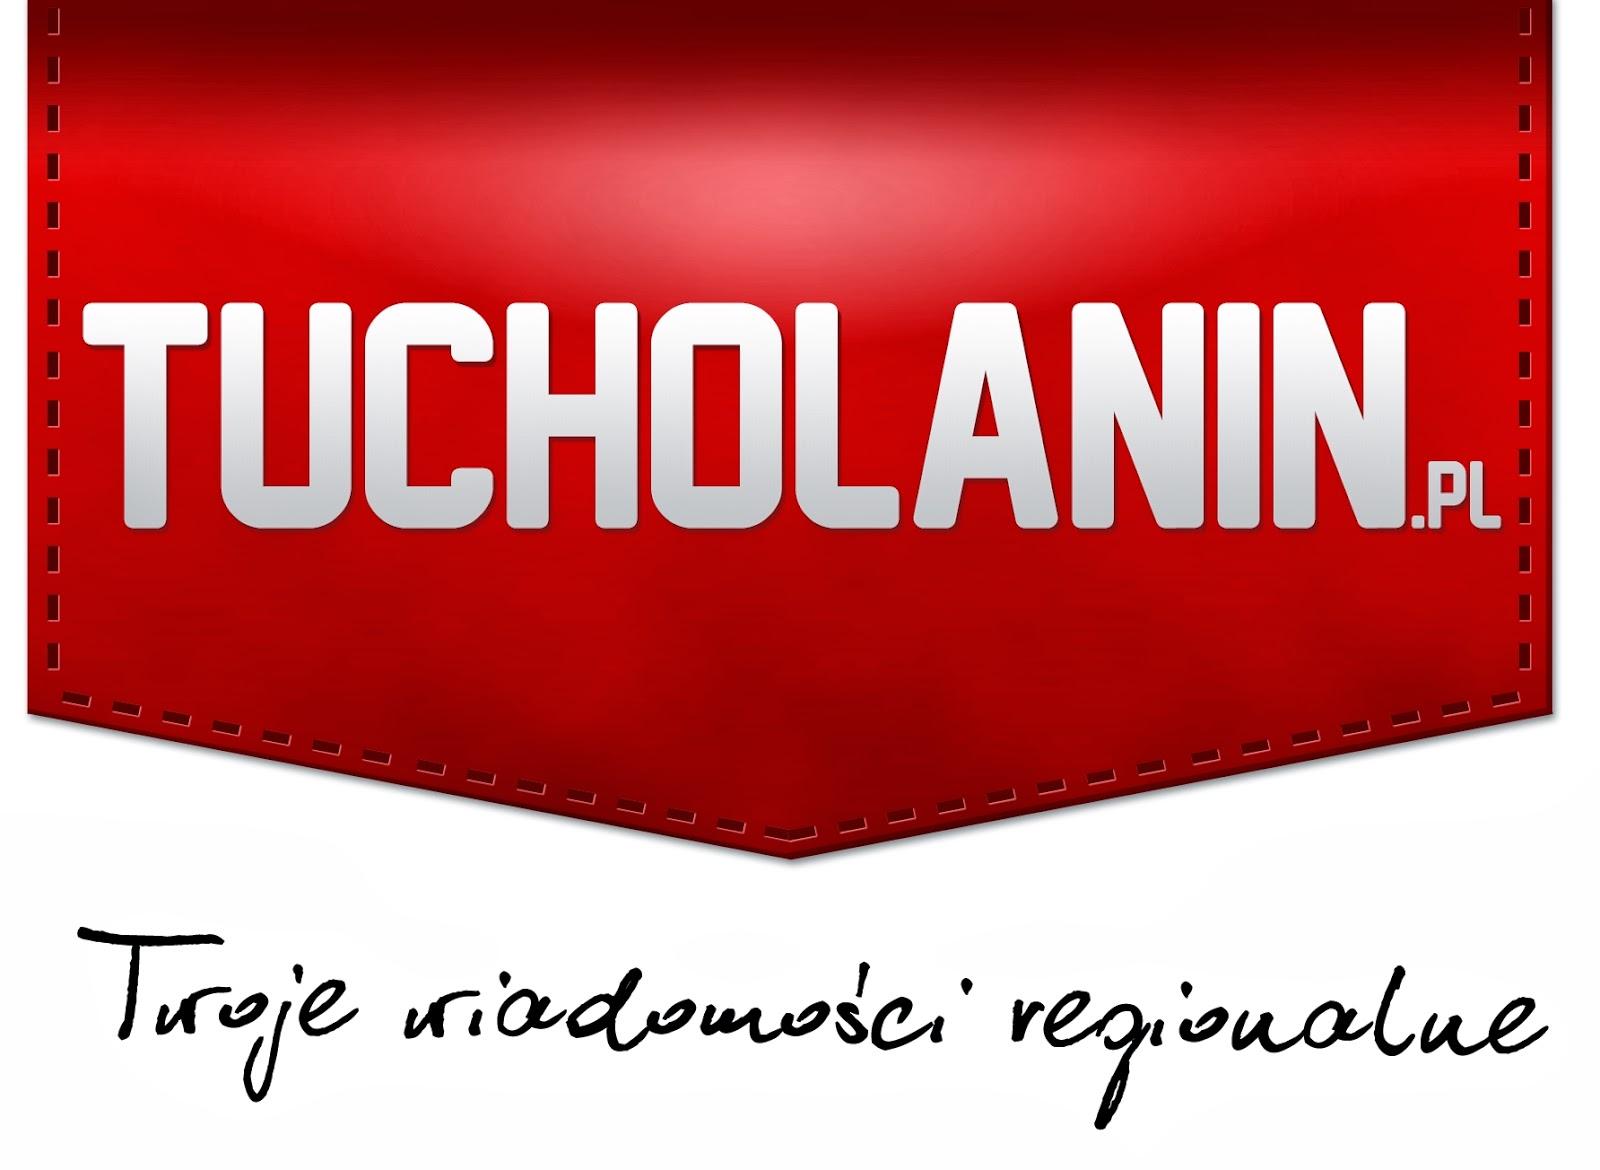 http://tucholanin.pl/